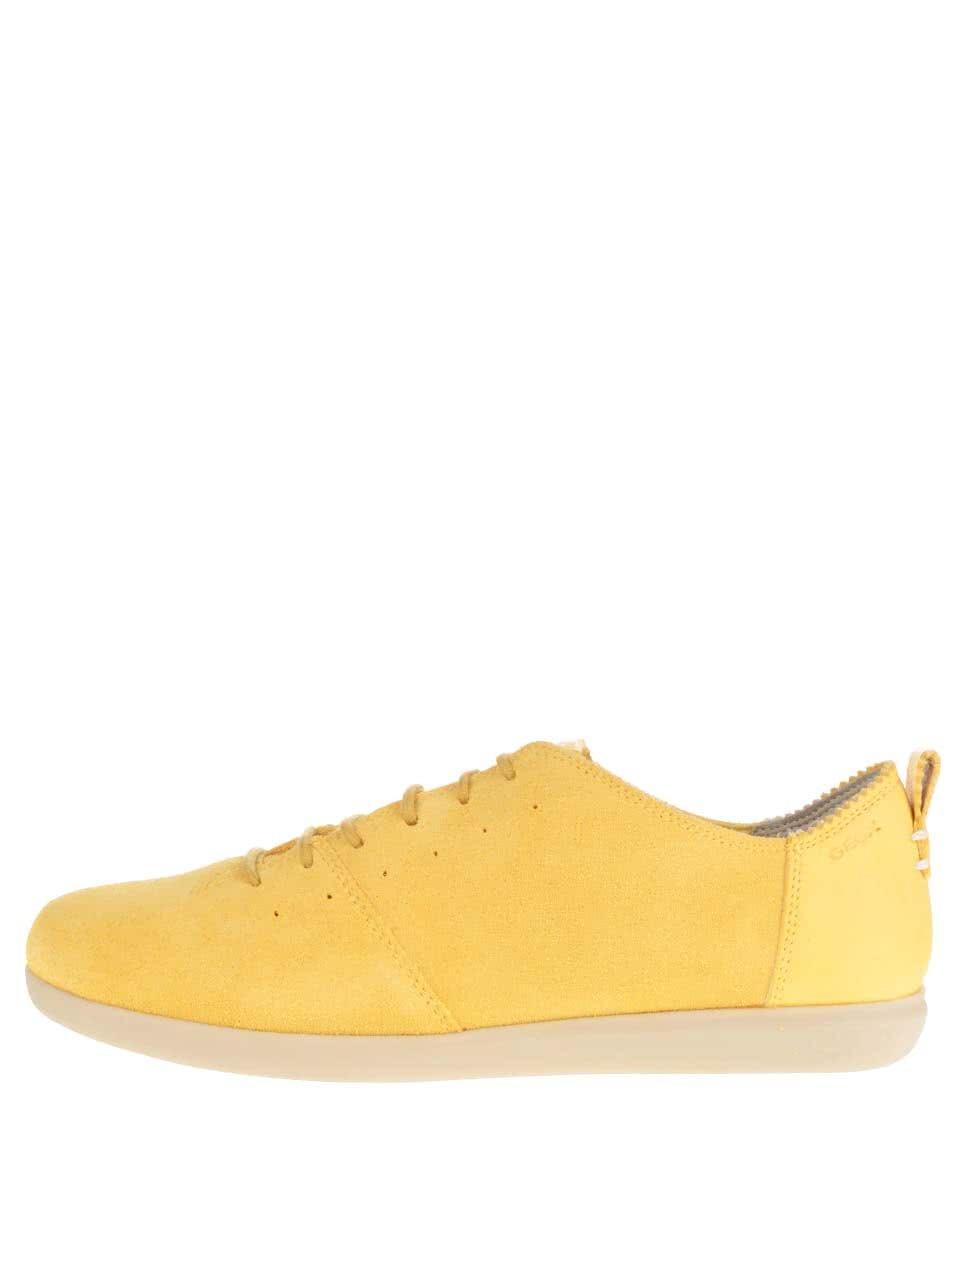 Žluté dámské nízké semišové tenisky Geox New Do C